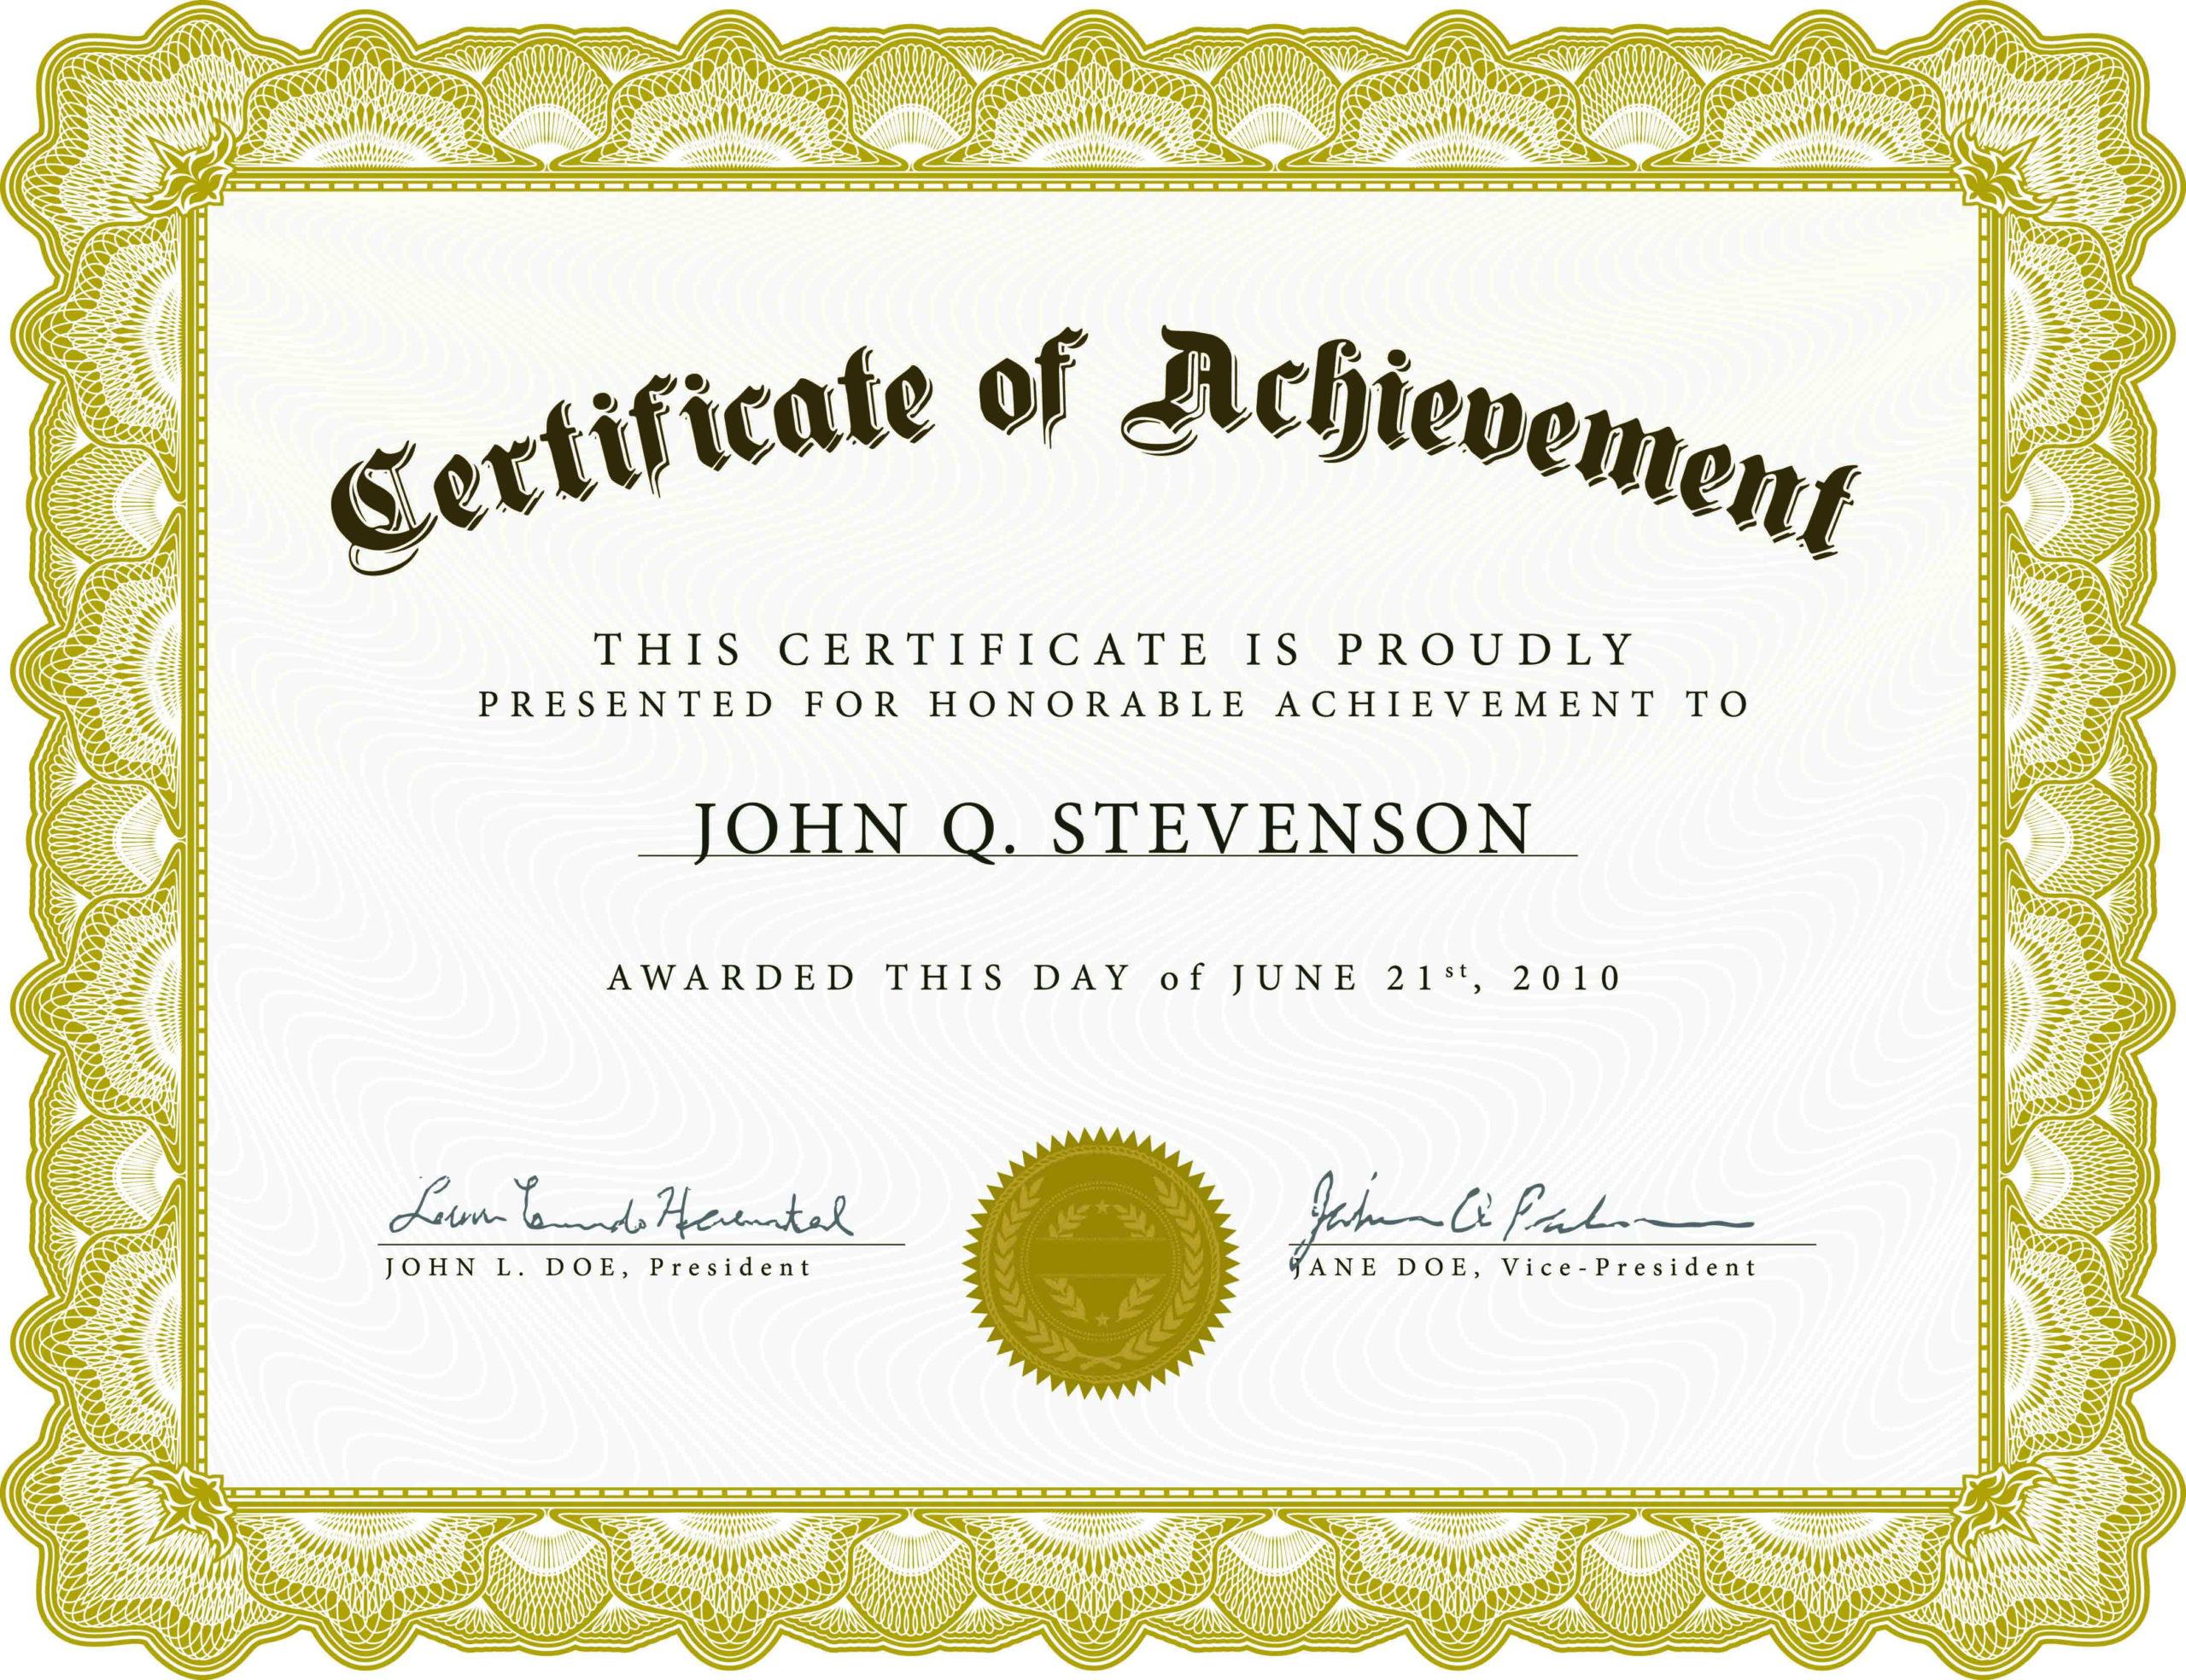 Certificatetemplatesprintableworddocpdf Inside Awesome Free Printable Blank Award Certificate Templates